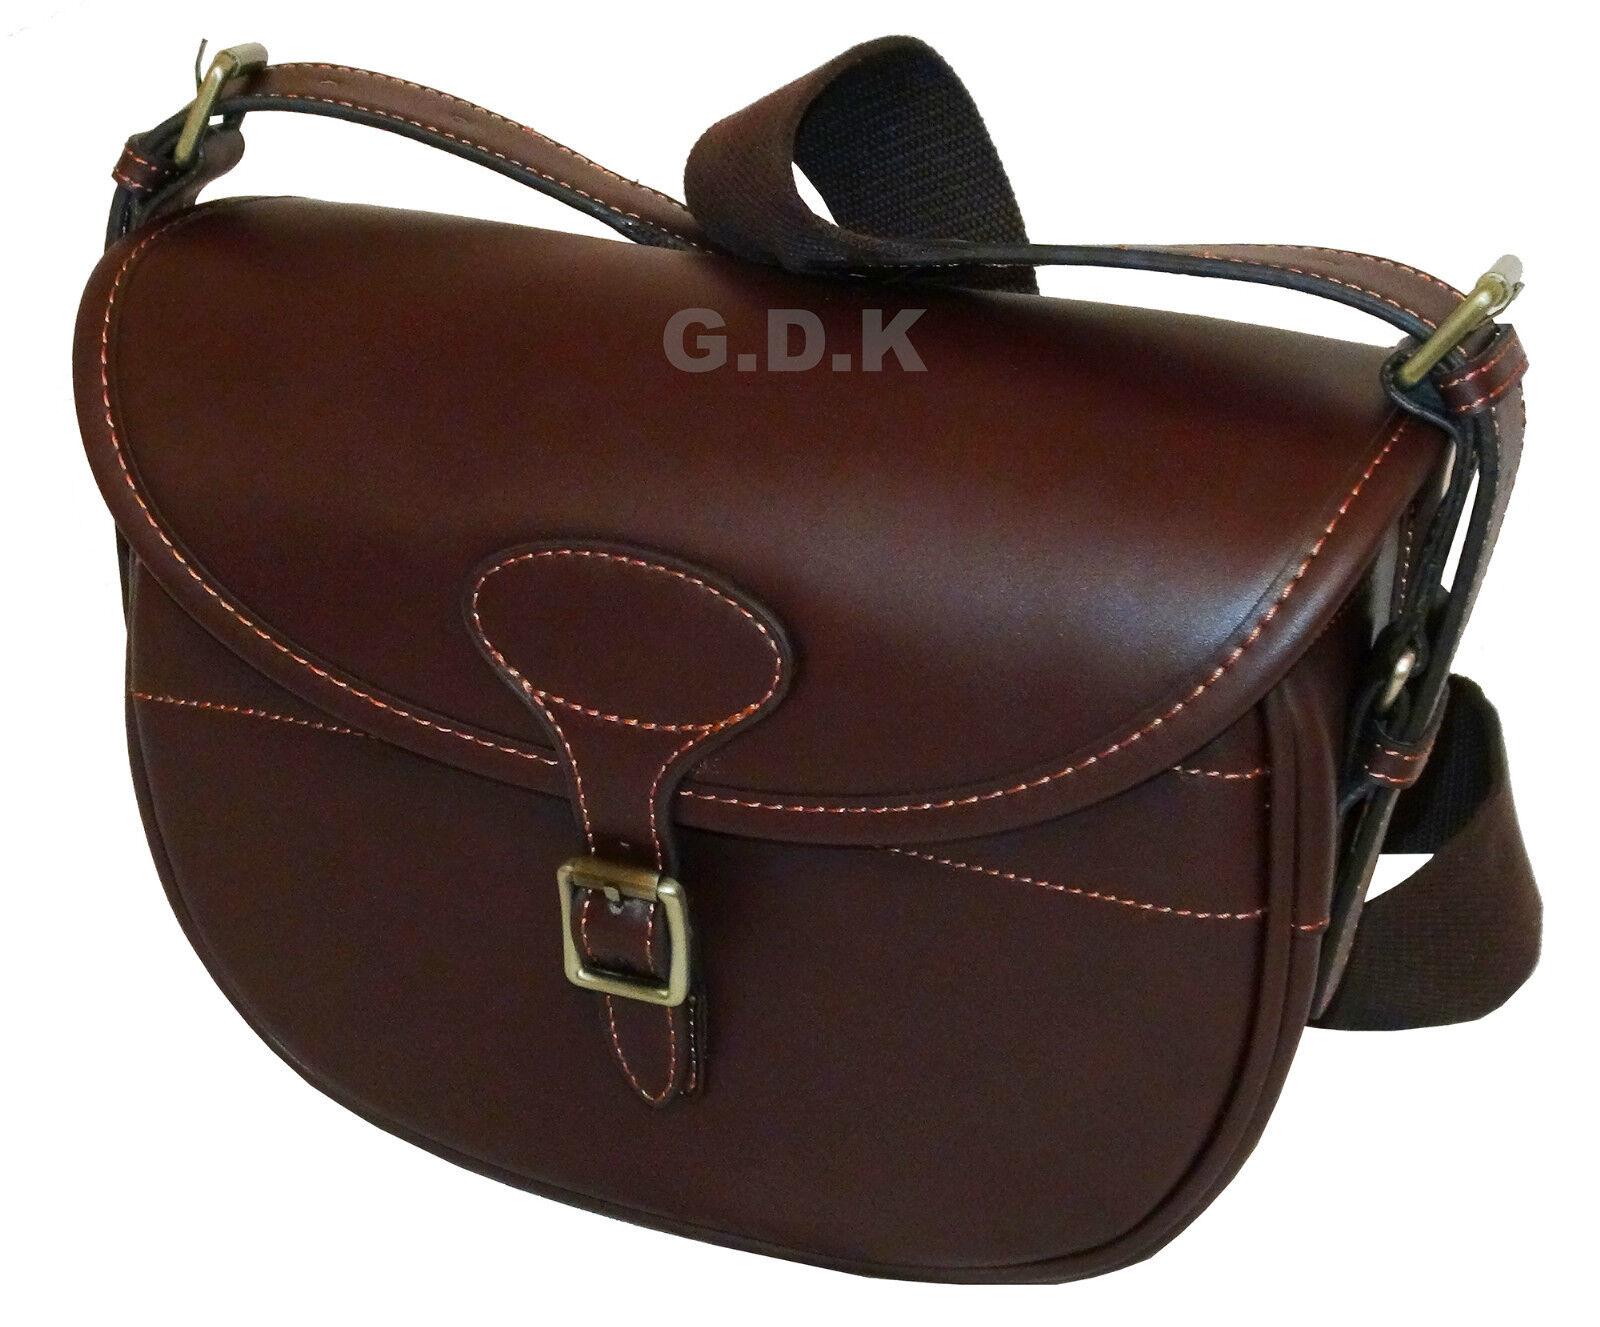 DARK BROWN GUARDIAN LEATHER CARTRIDGE BAG, POUCH, FOR 100-125 SHELLS,GUN ha075DB